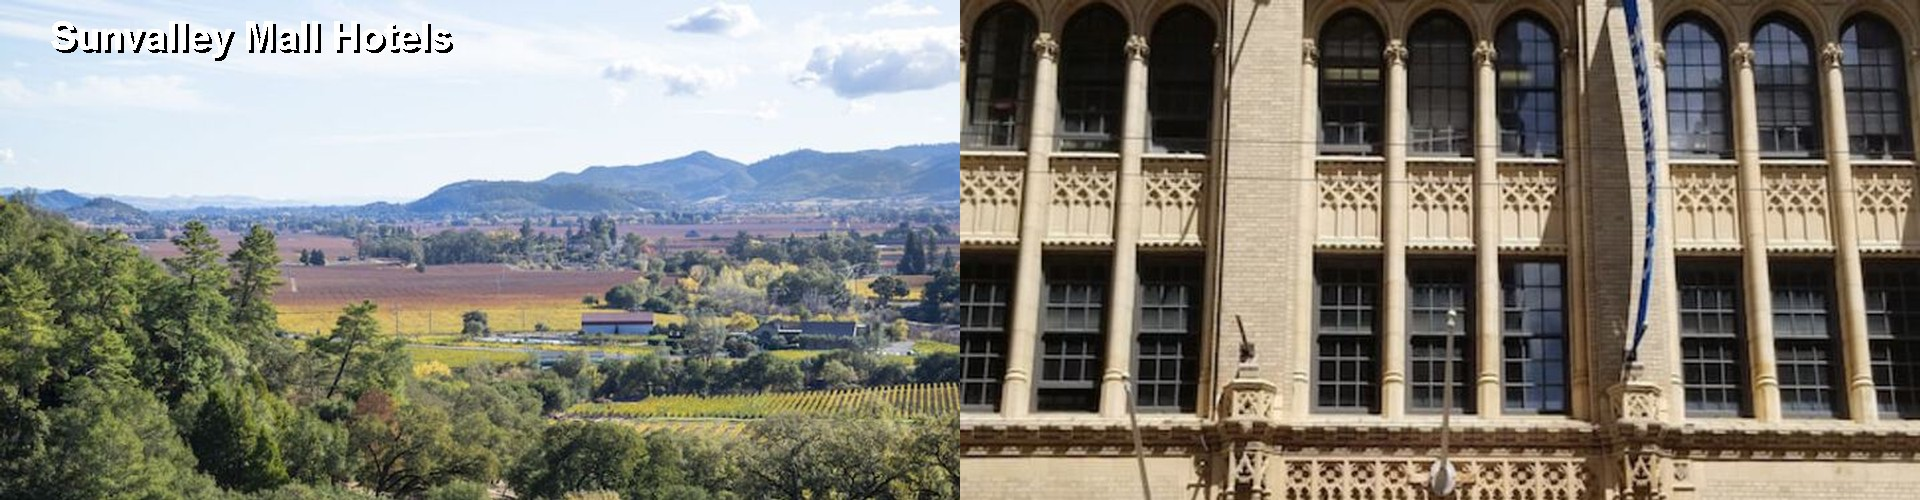 53 hotels near sunvalley mall in concord ca